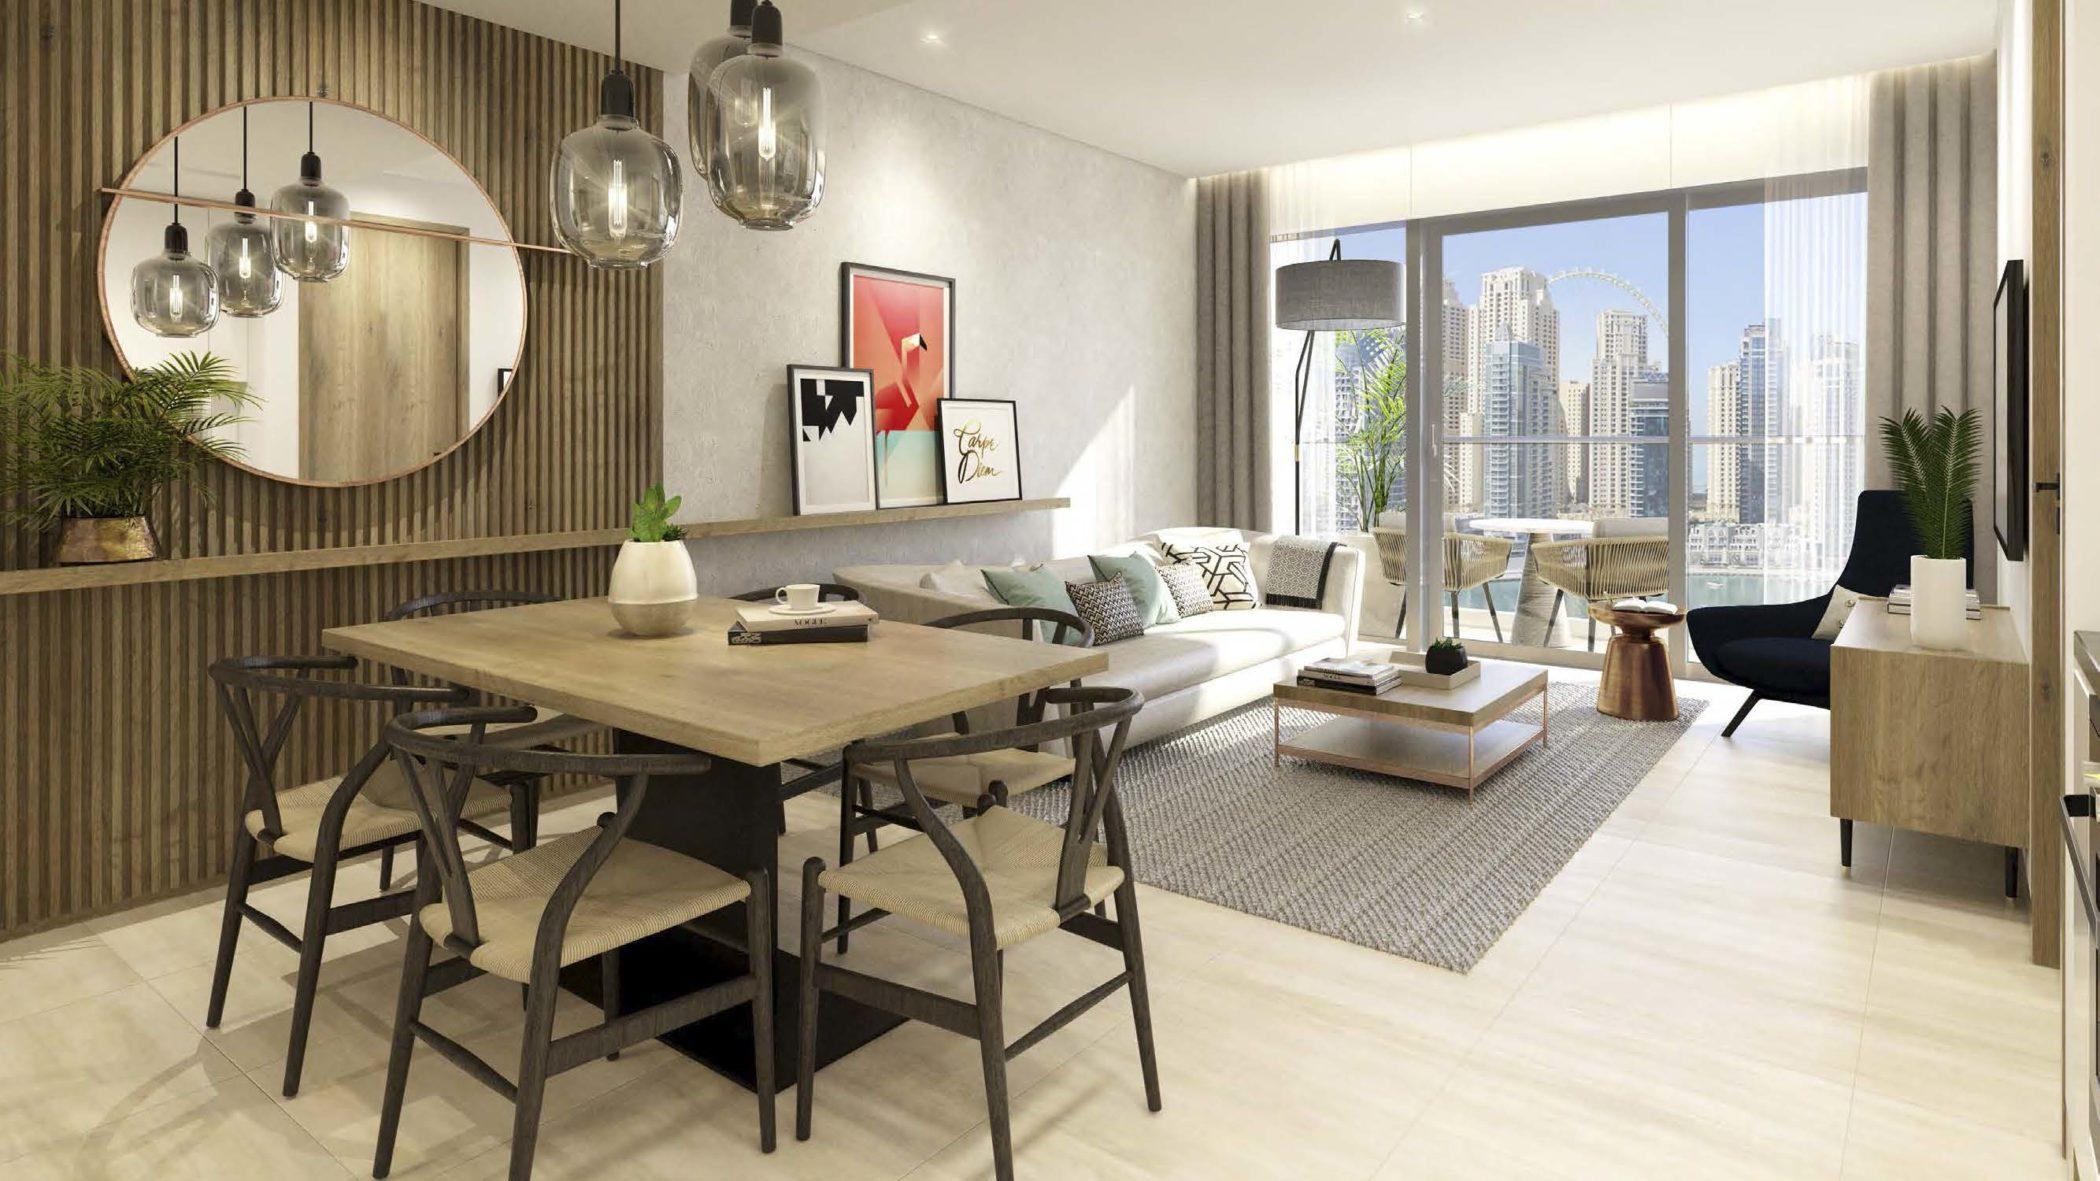 Vida Residences by Emaar at Dubai Marina. Luxury apartments for sale in Dubai._1